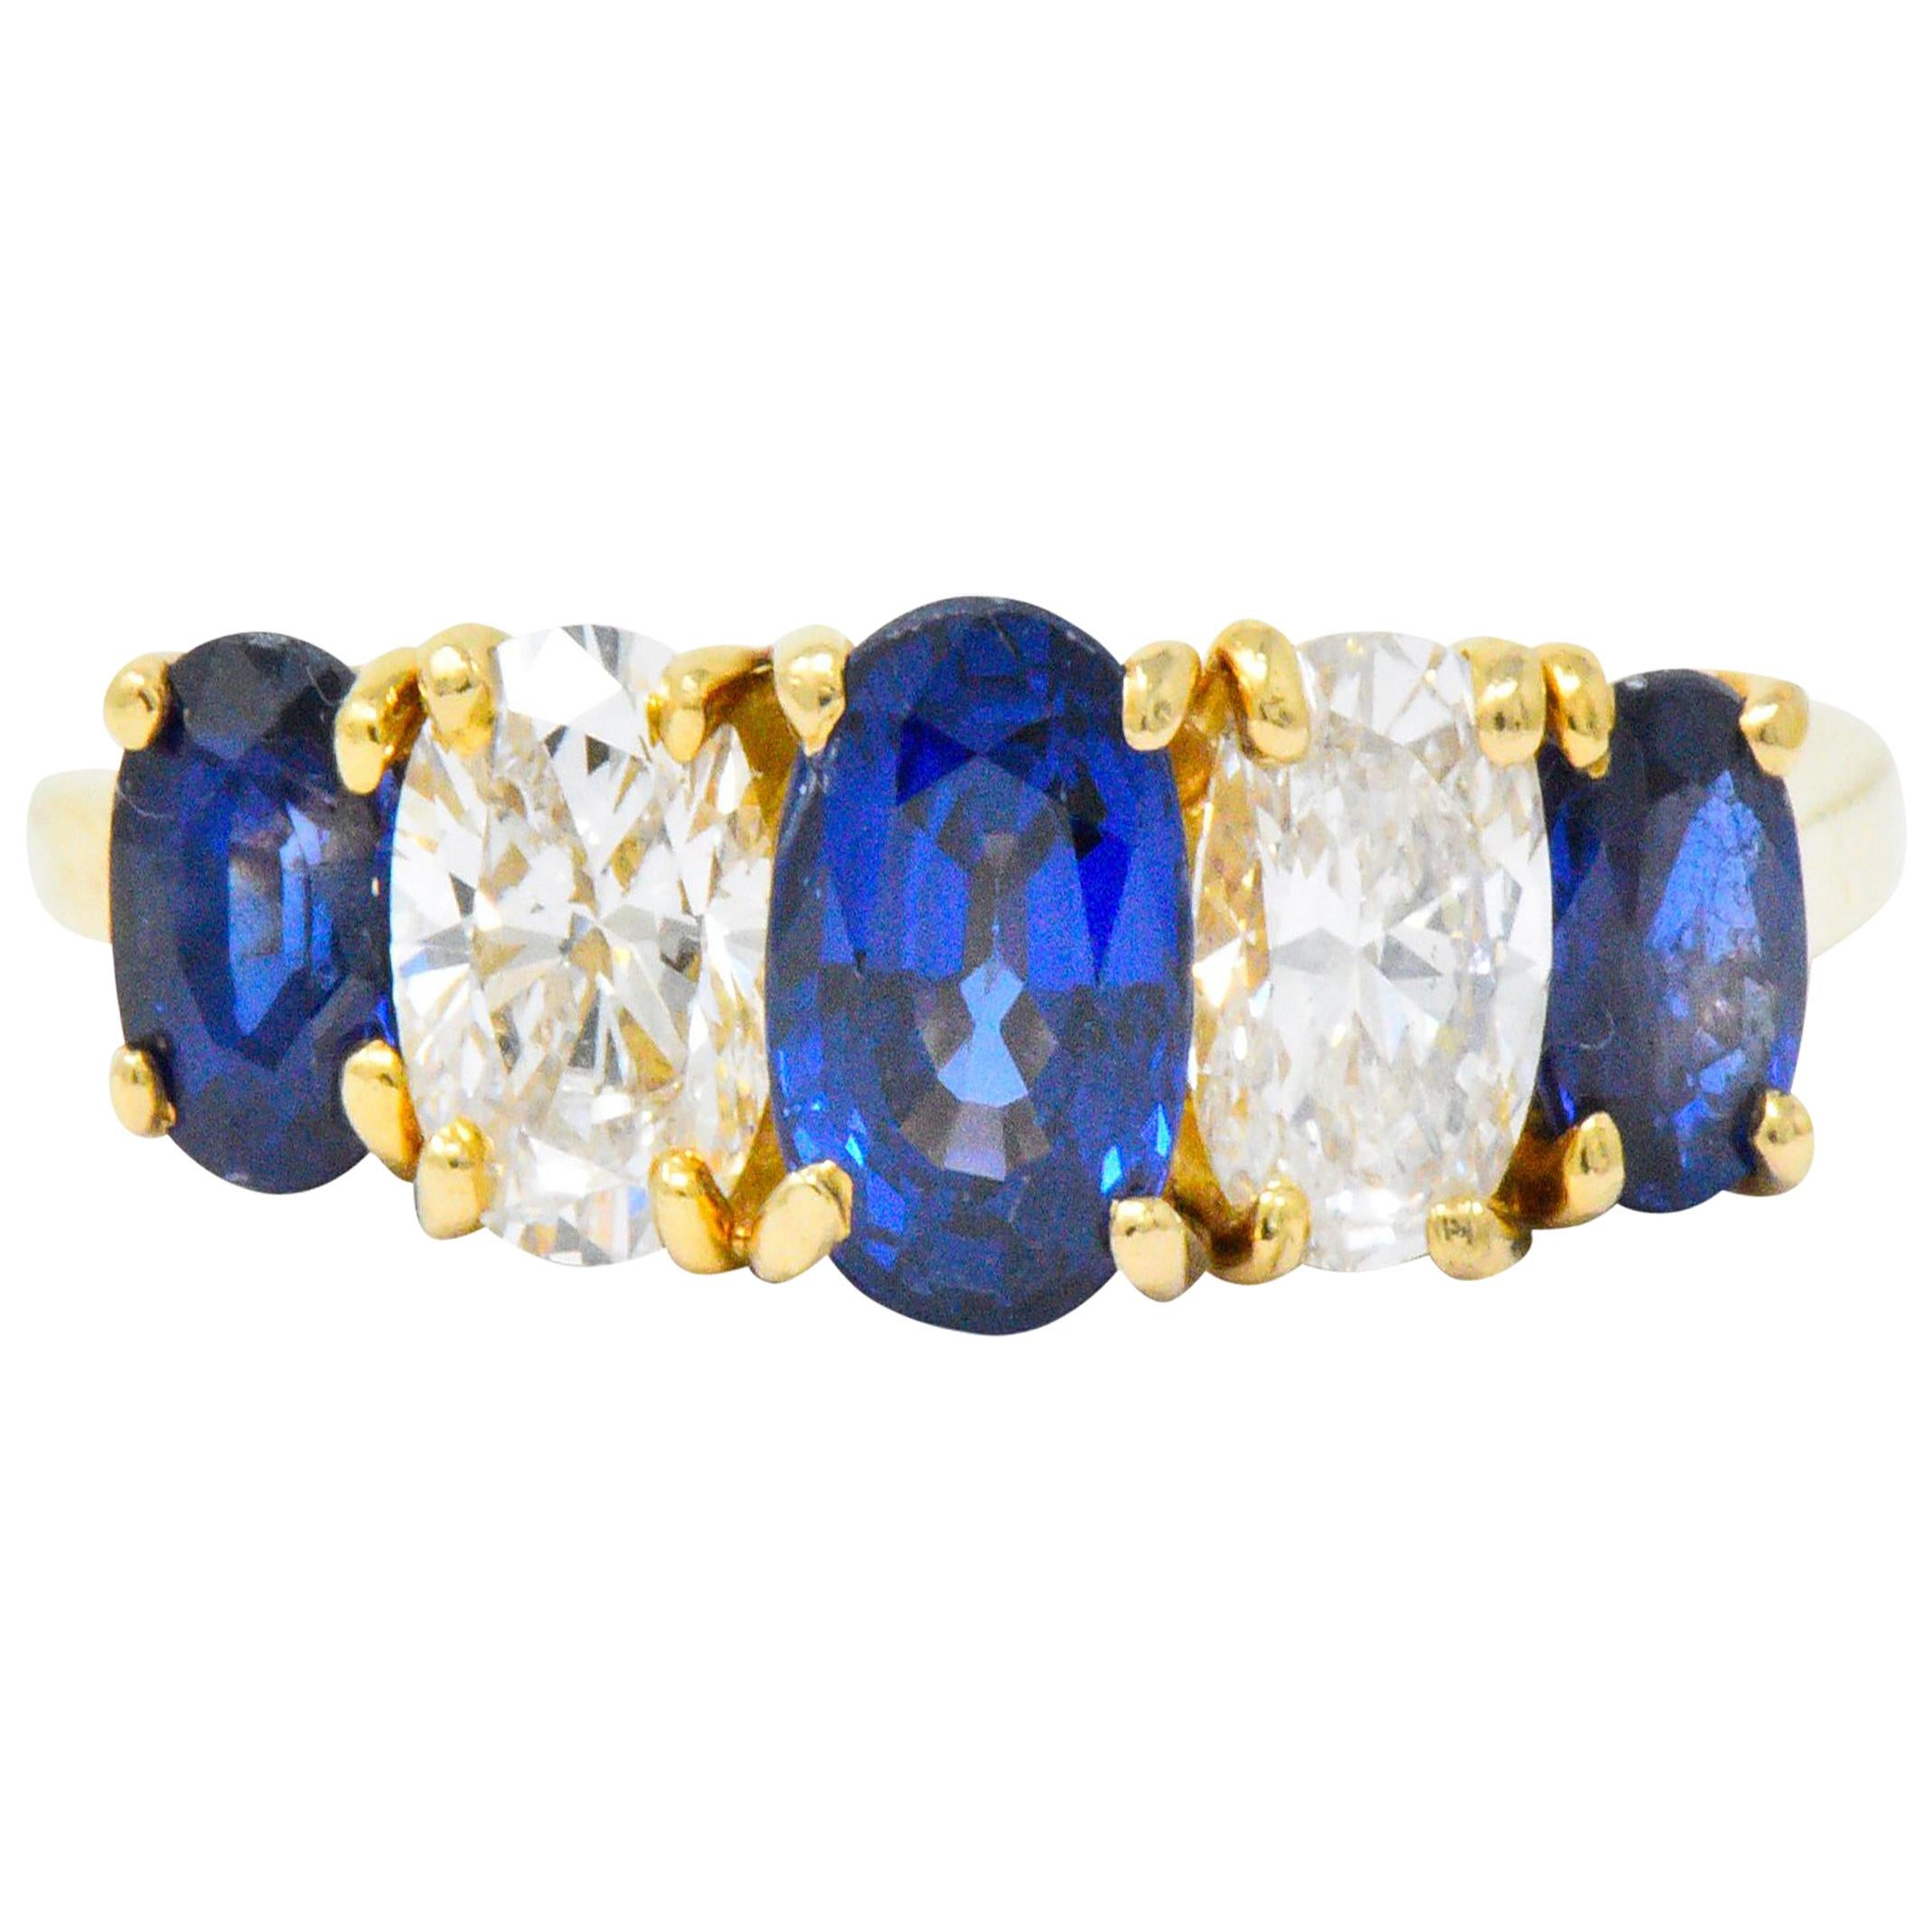 Vintage 2.08 Carats Sapphire Diamond 18 Karat Gold Band Ring